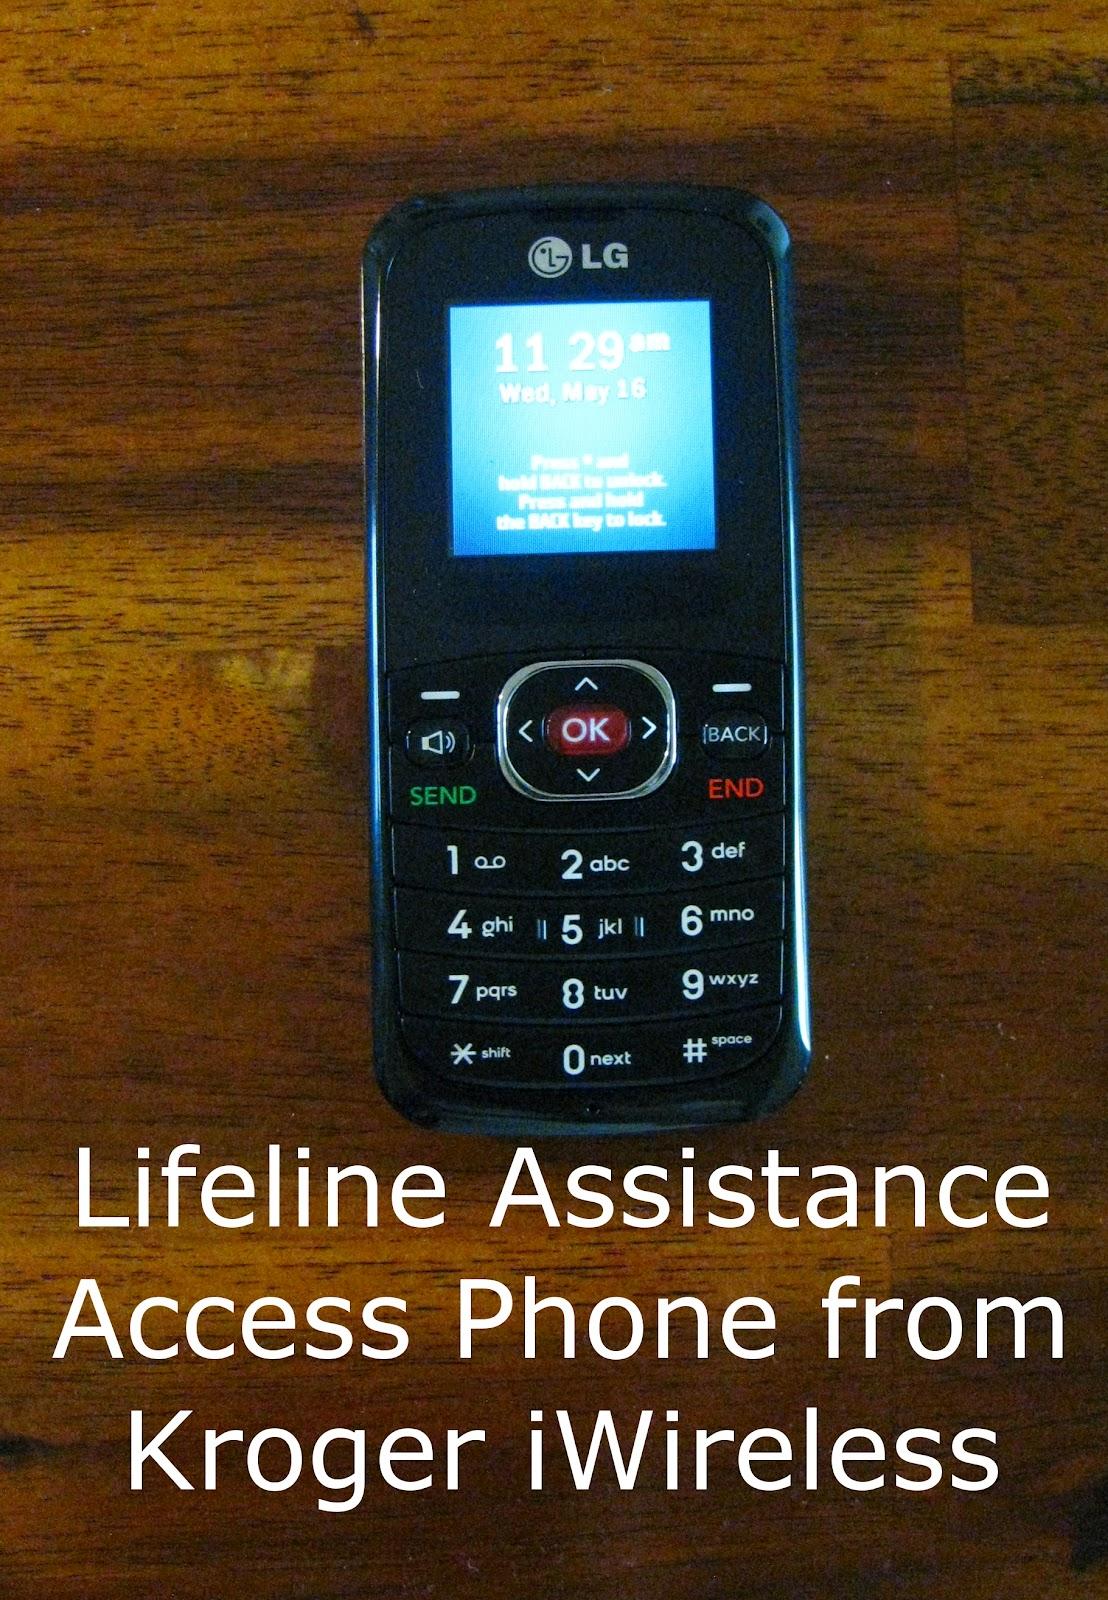 Our Lifeline Access Wireless Phone